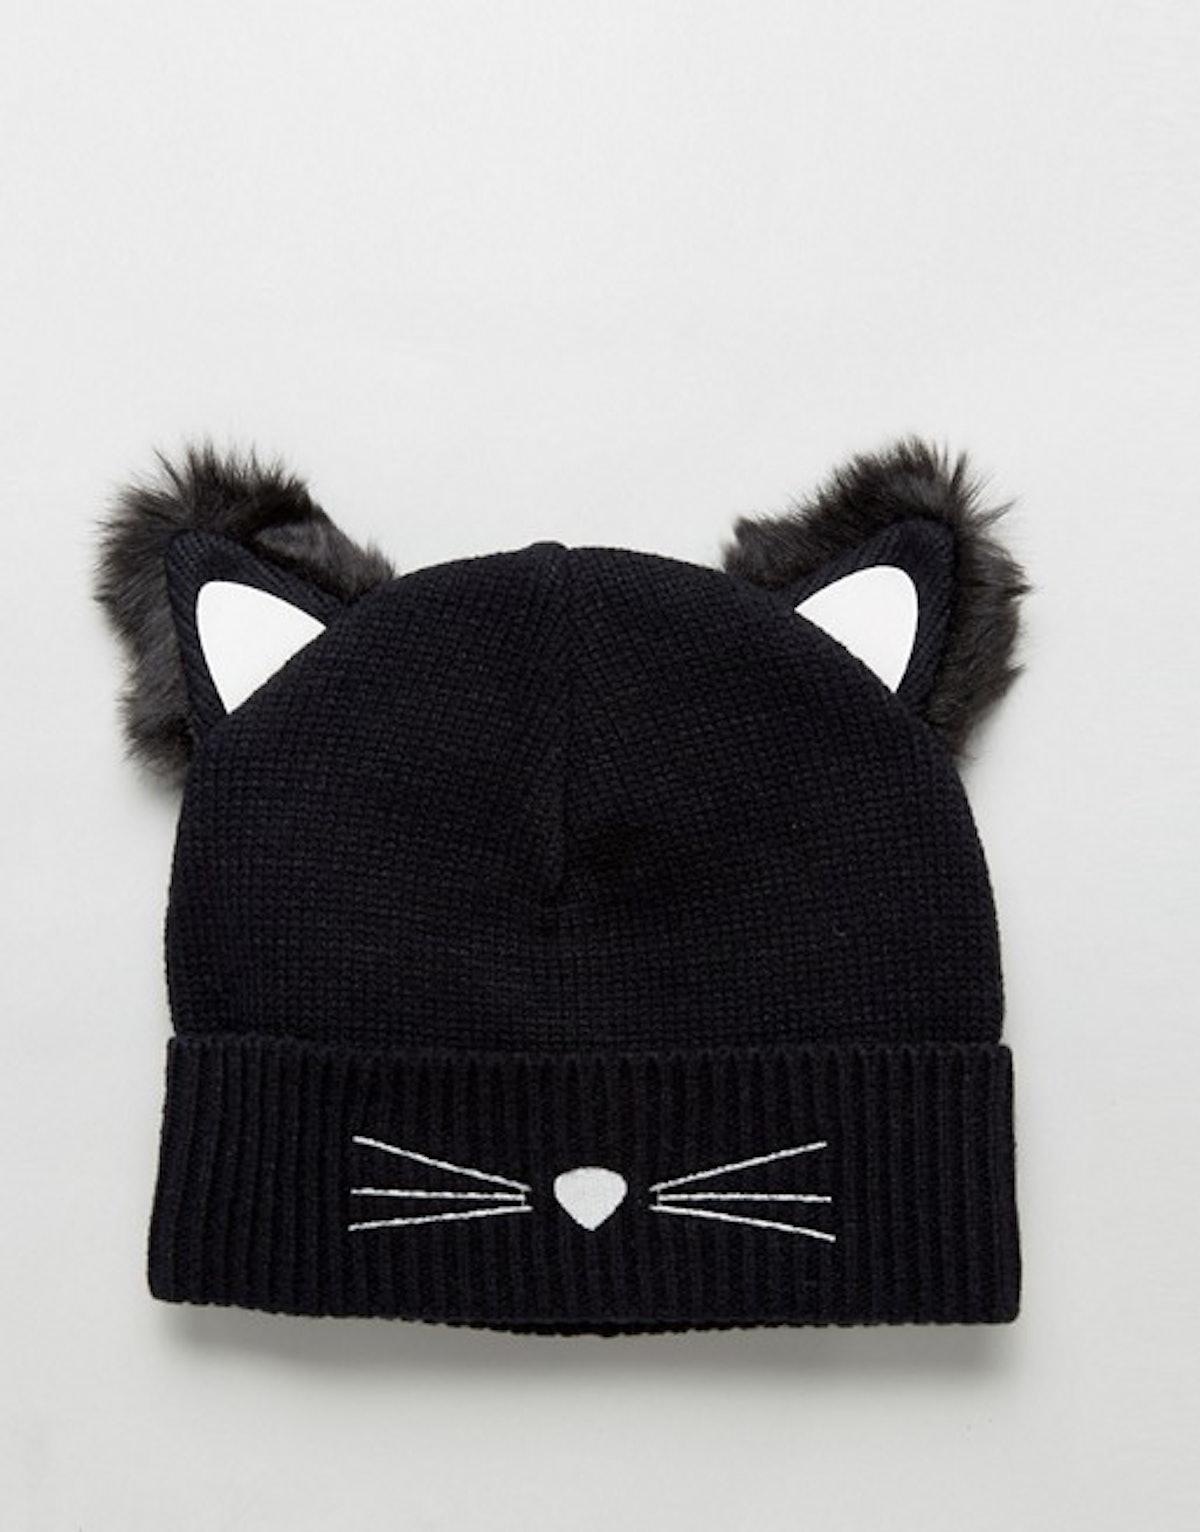 Cat Ears Beanie With Glow In The Dark Yarn